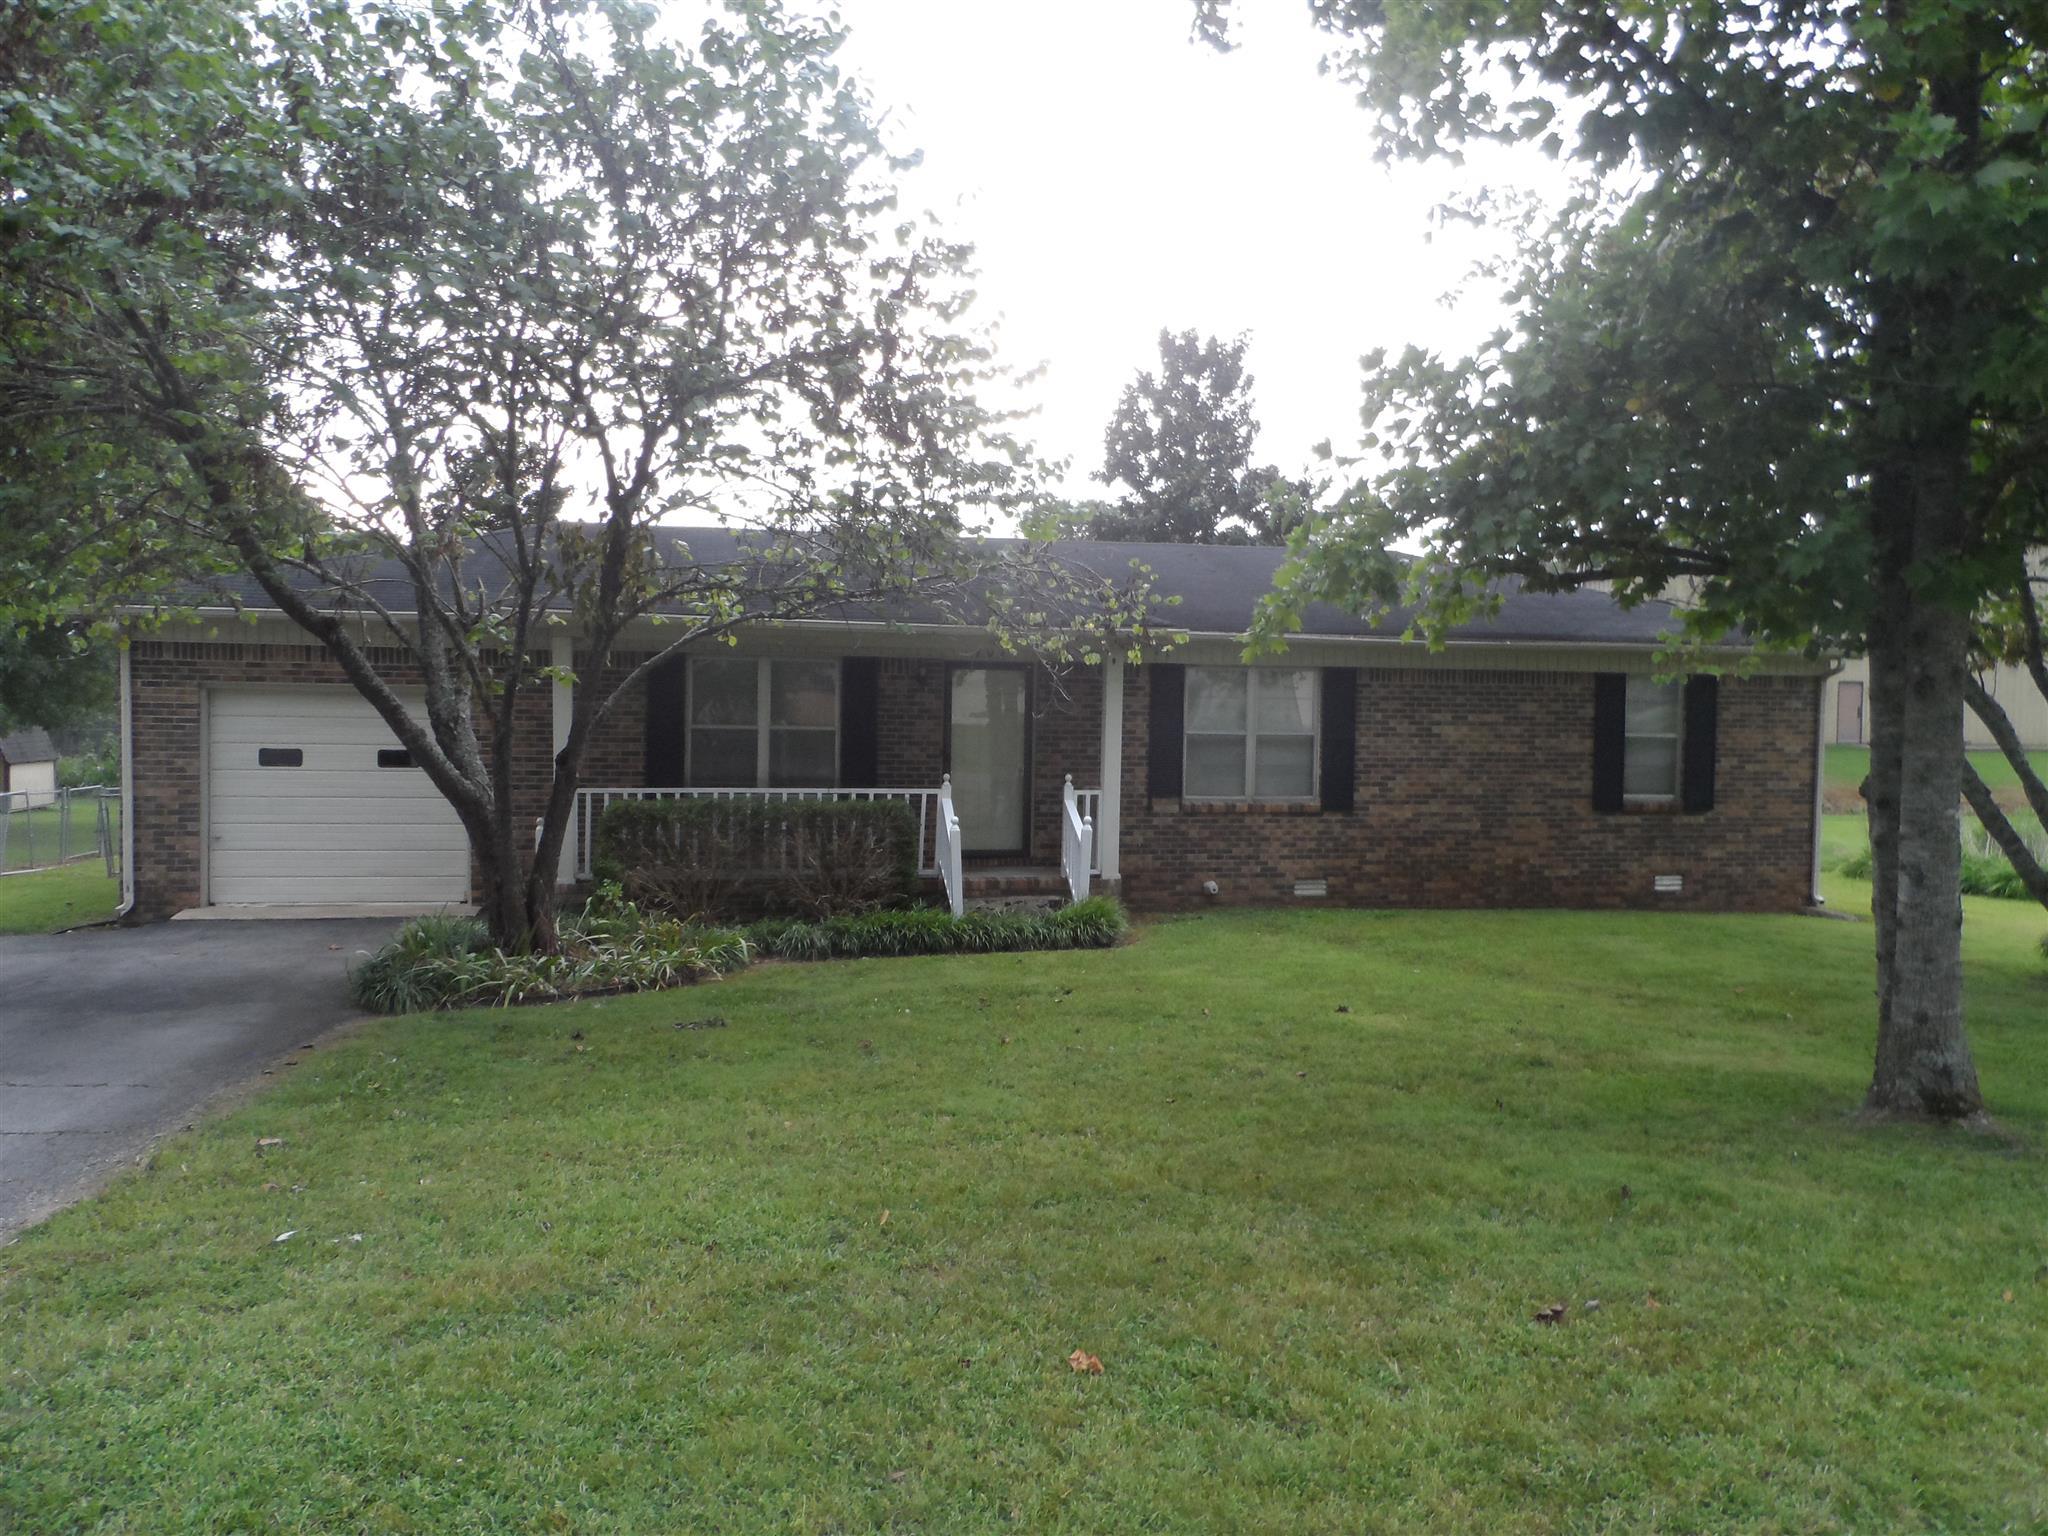 907 Livingston Dr, Pulaski, TN 38478 - Pulaski, TN real estate listing